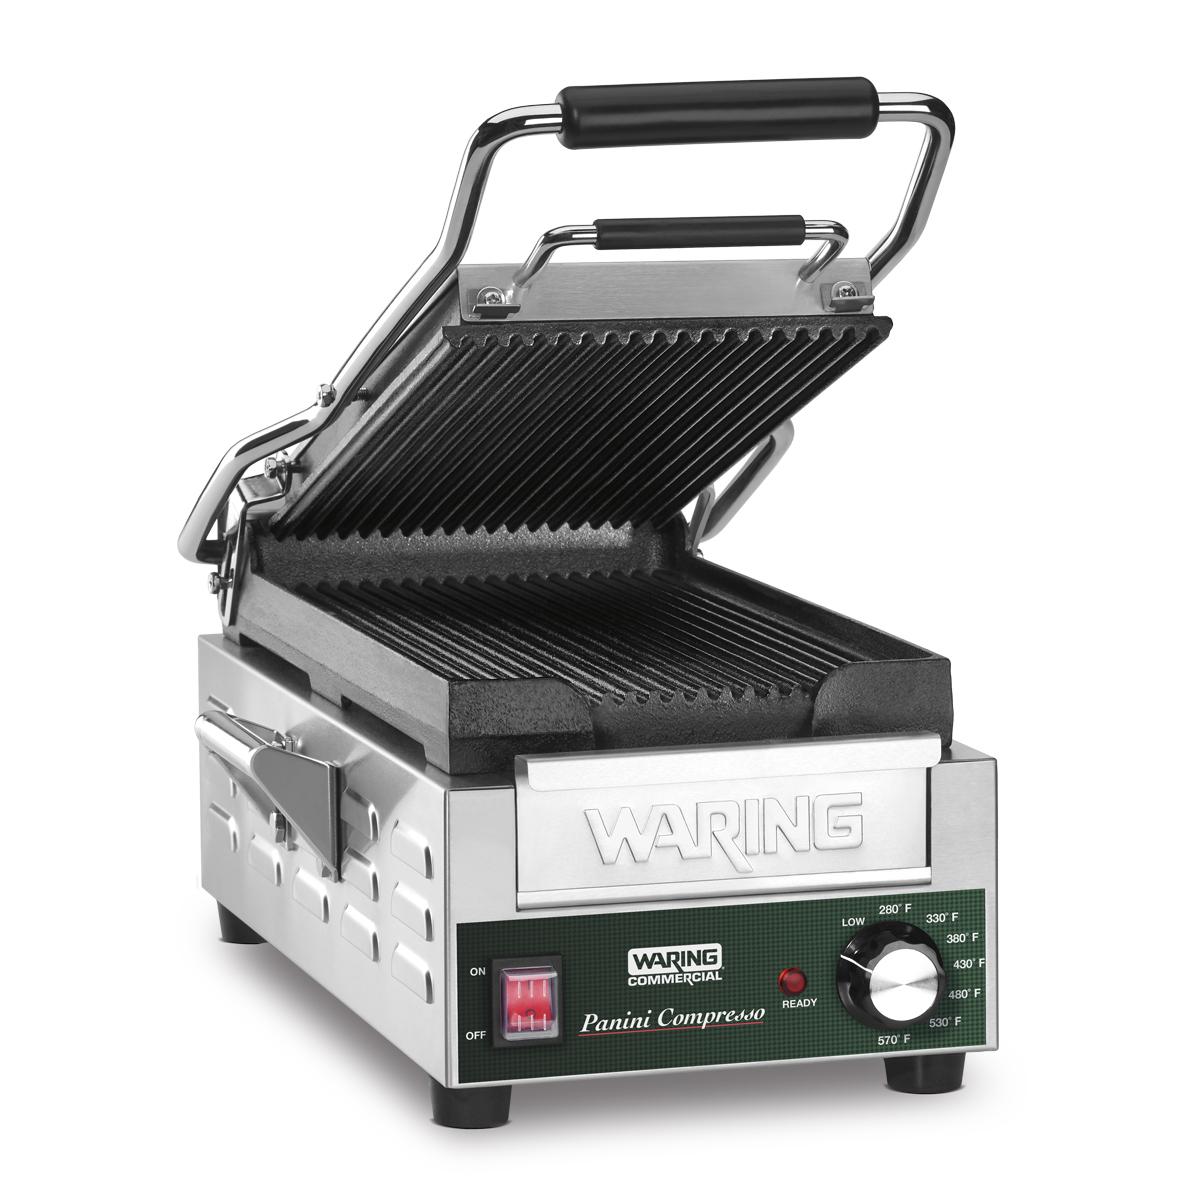 Waring WPG200 sandwich / panini grill